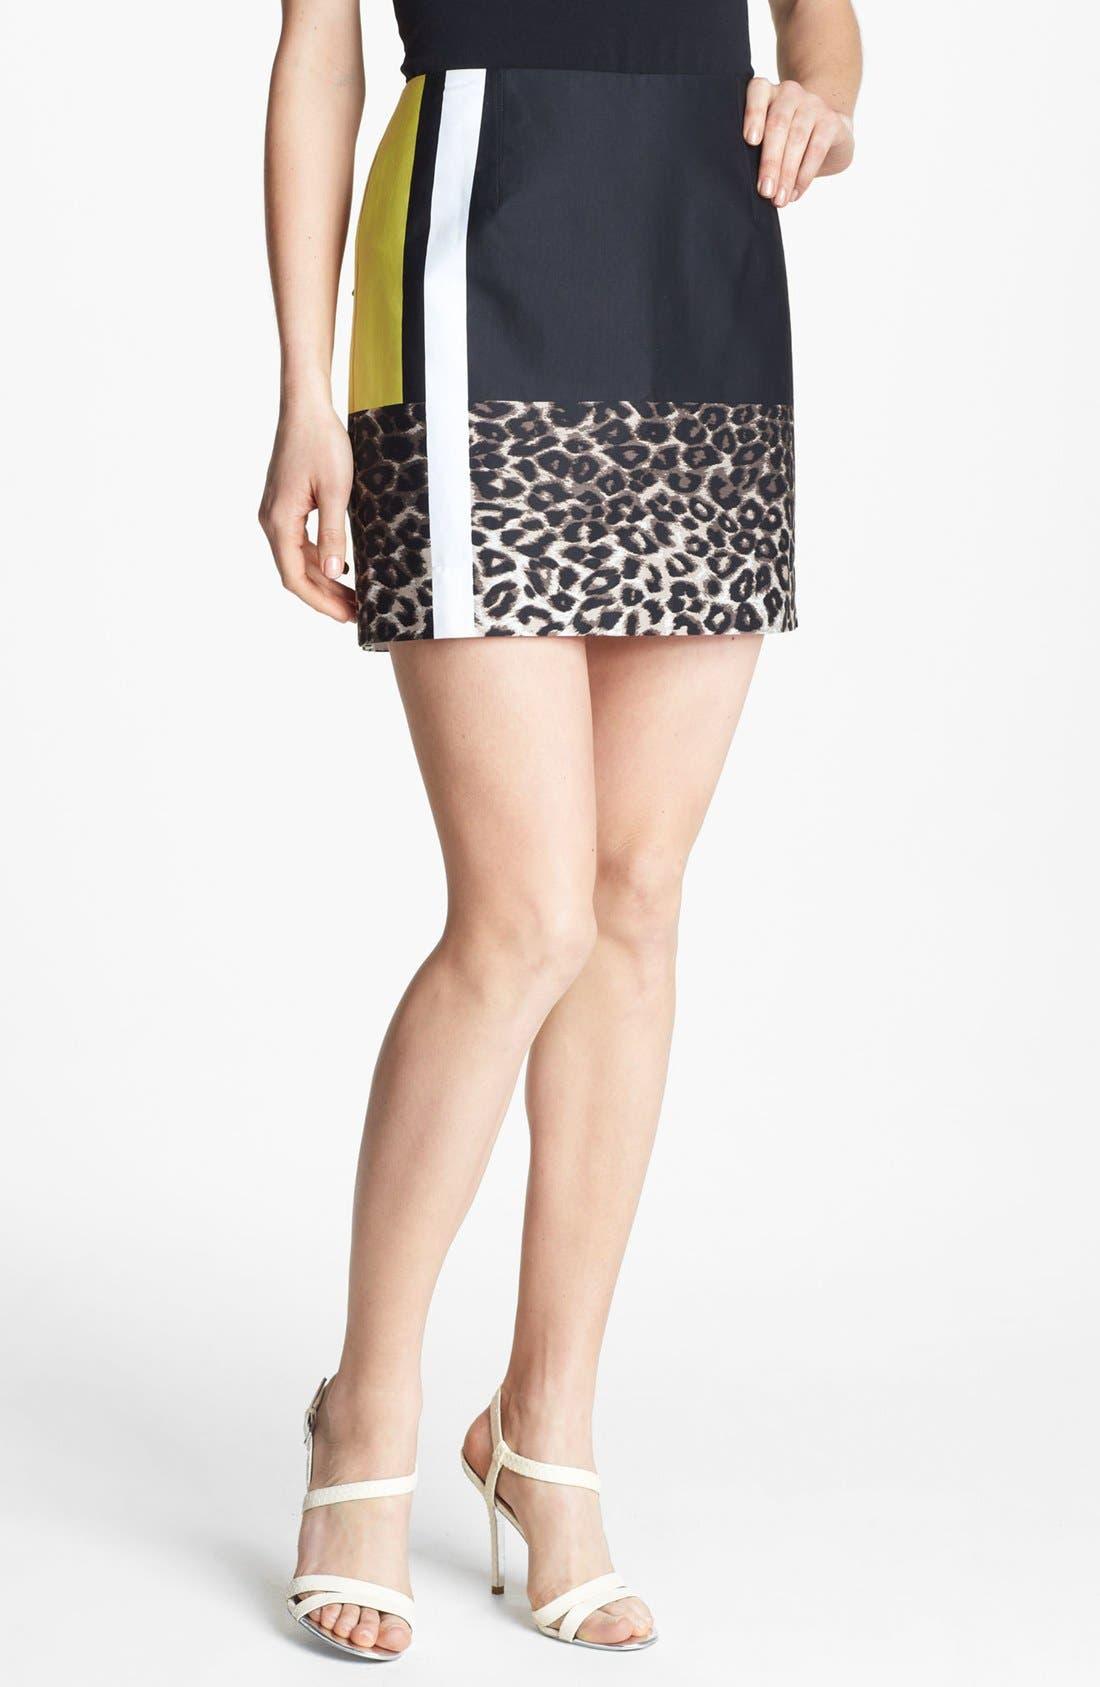 Alternate Image 1 Selected - Kenneth Cole New York 'Juliet' Colorblock Skirt